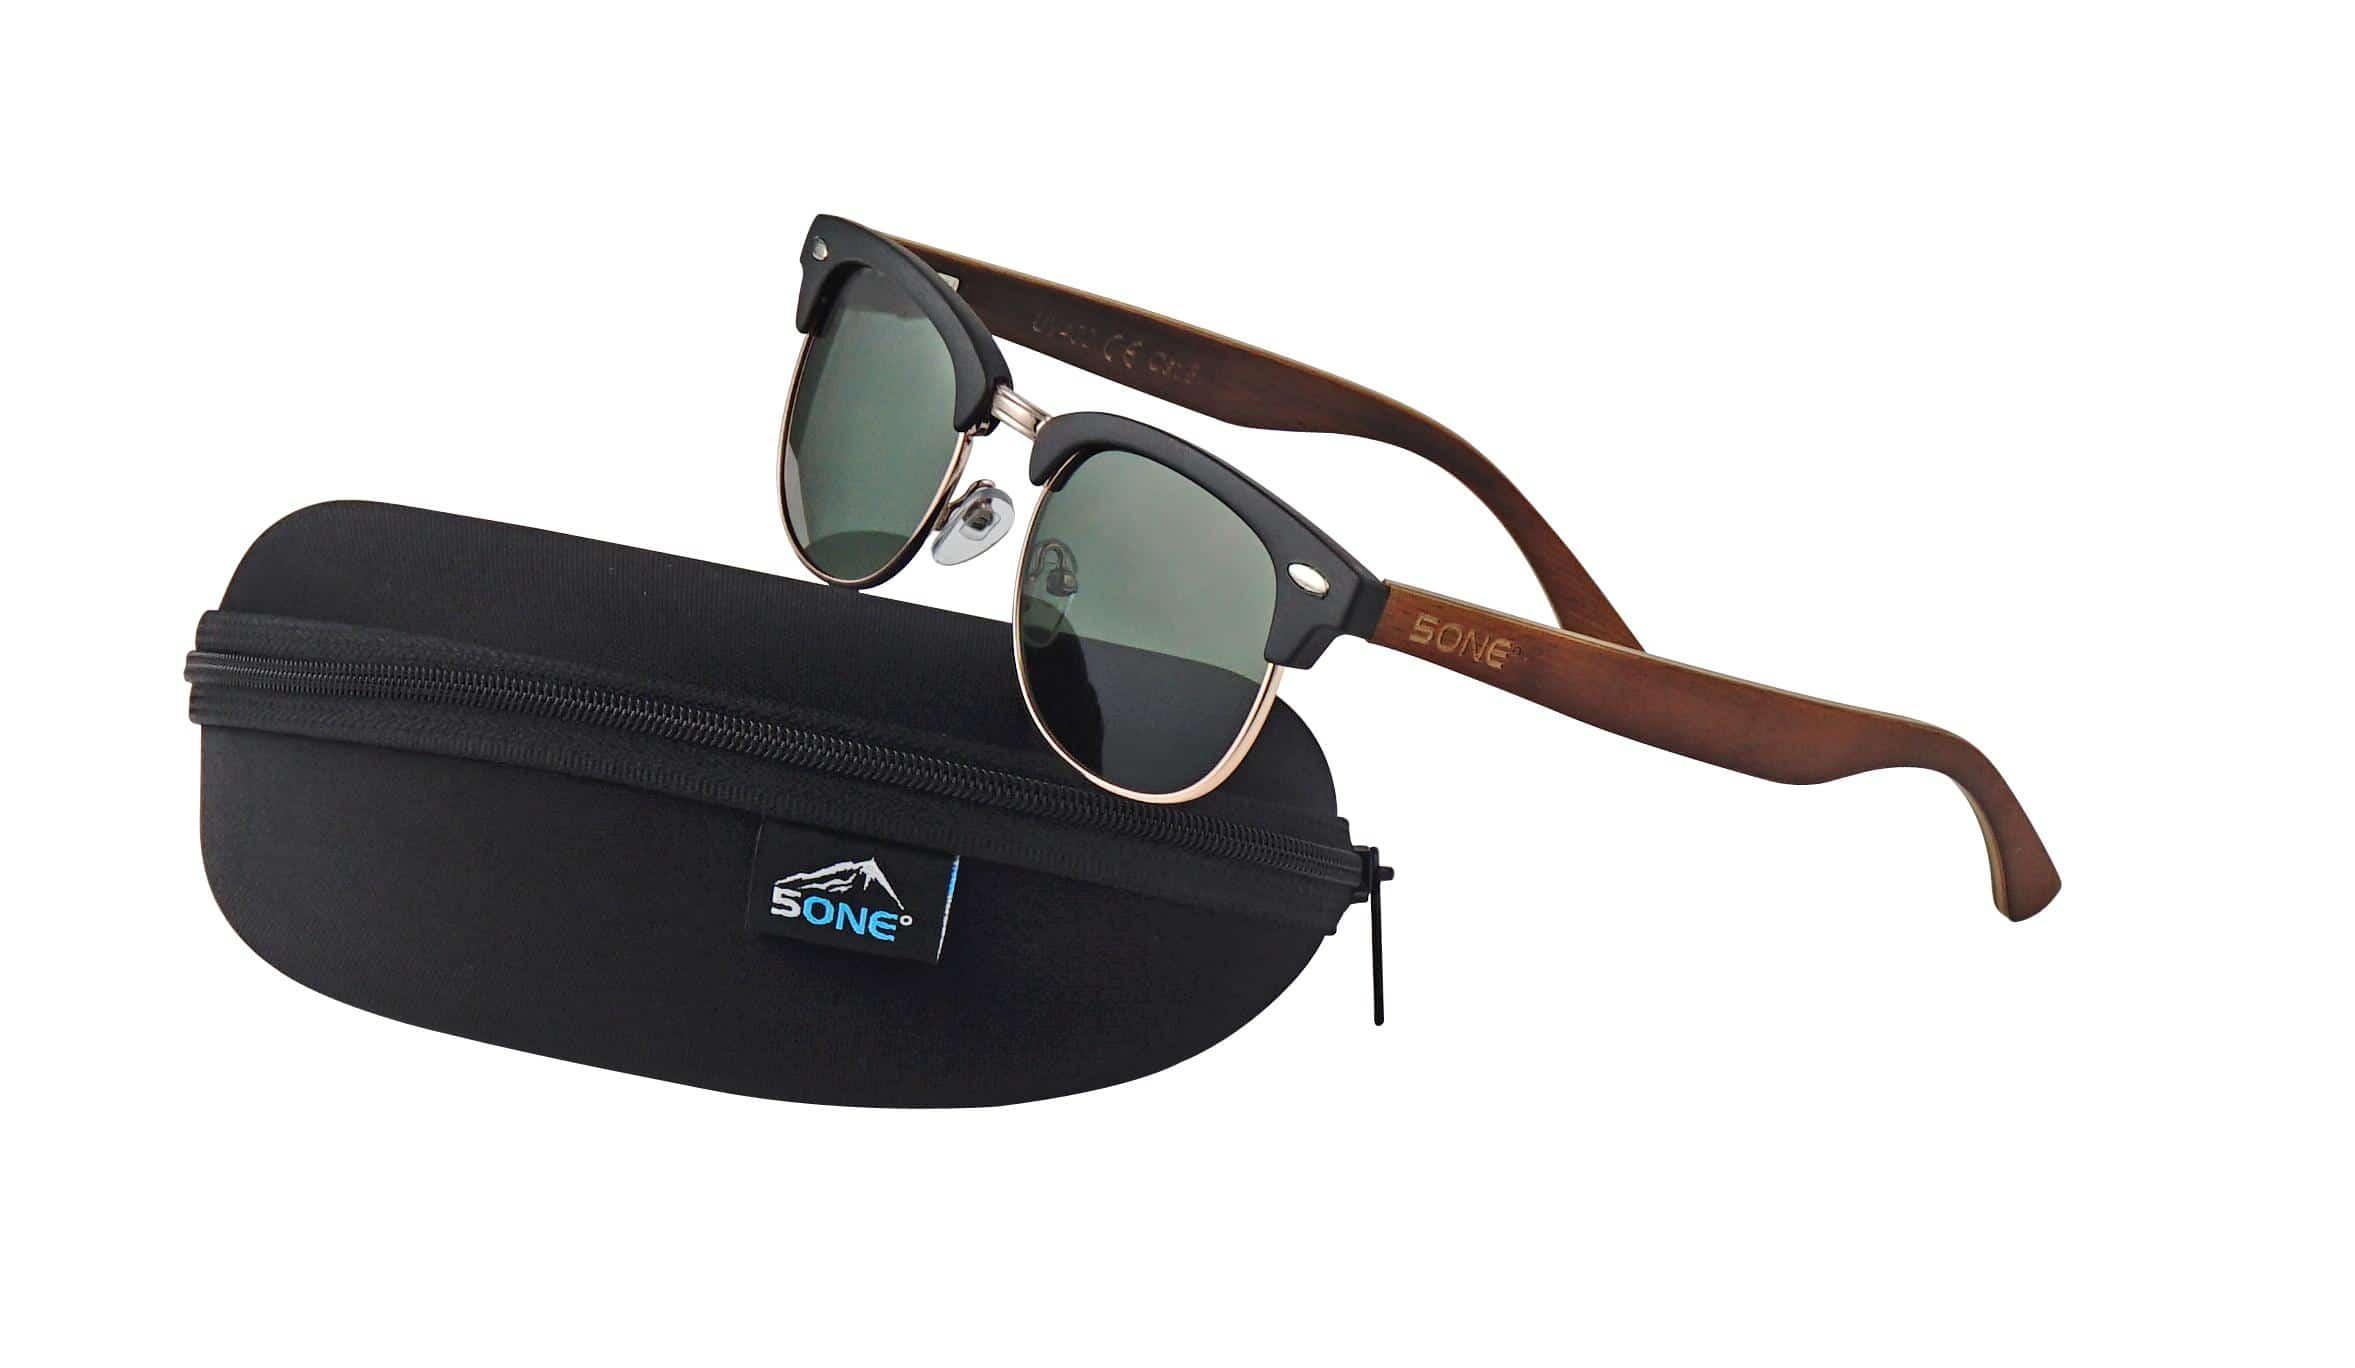 5one® Capri Black - Grijze lens - zwart frame - clubmastermodel